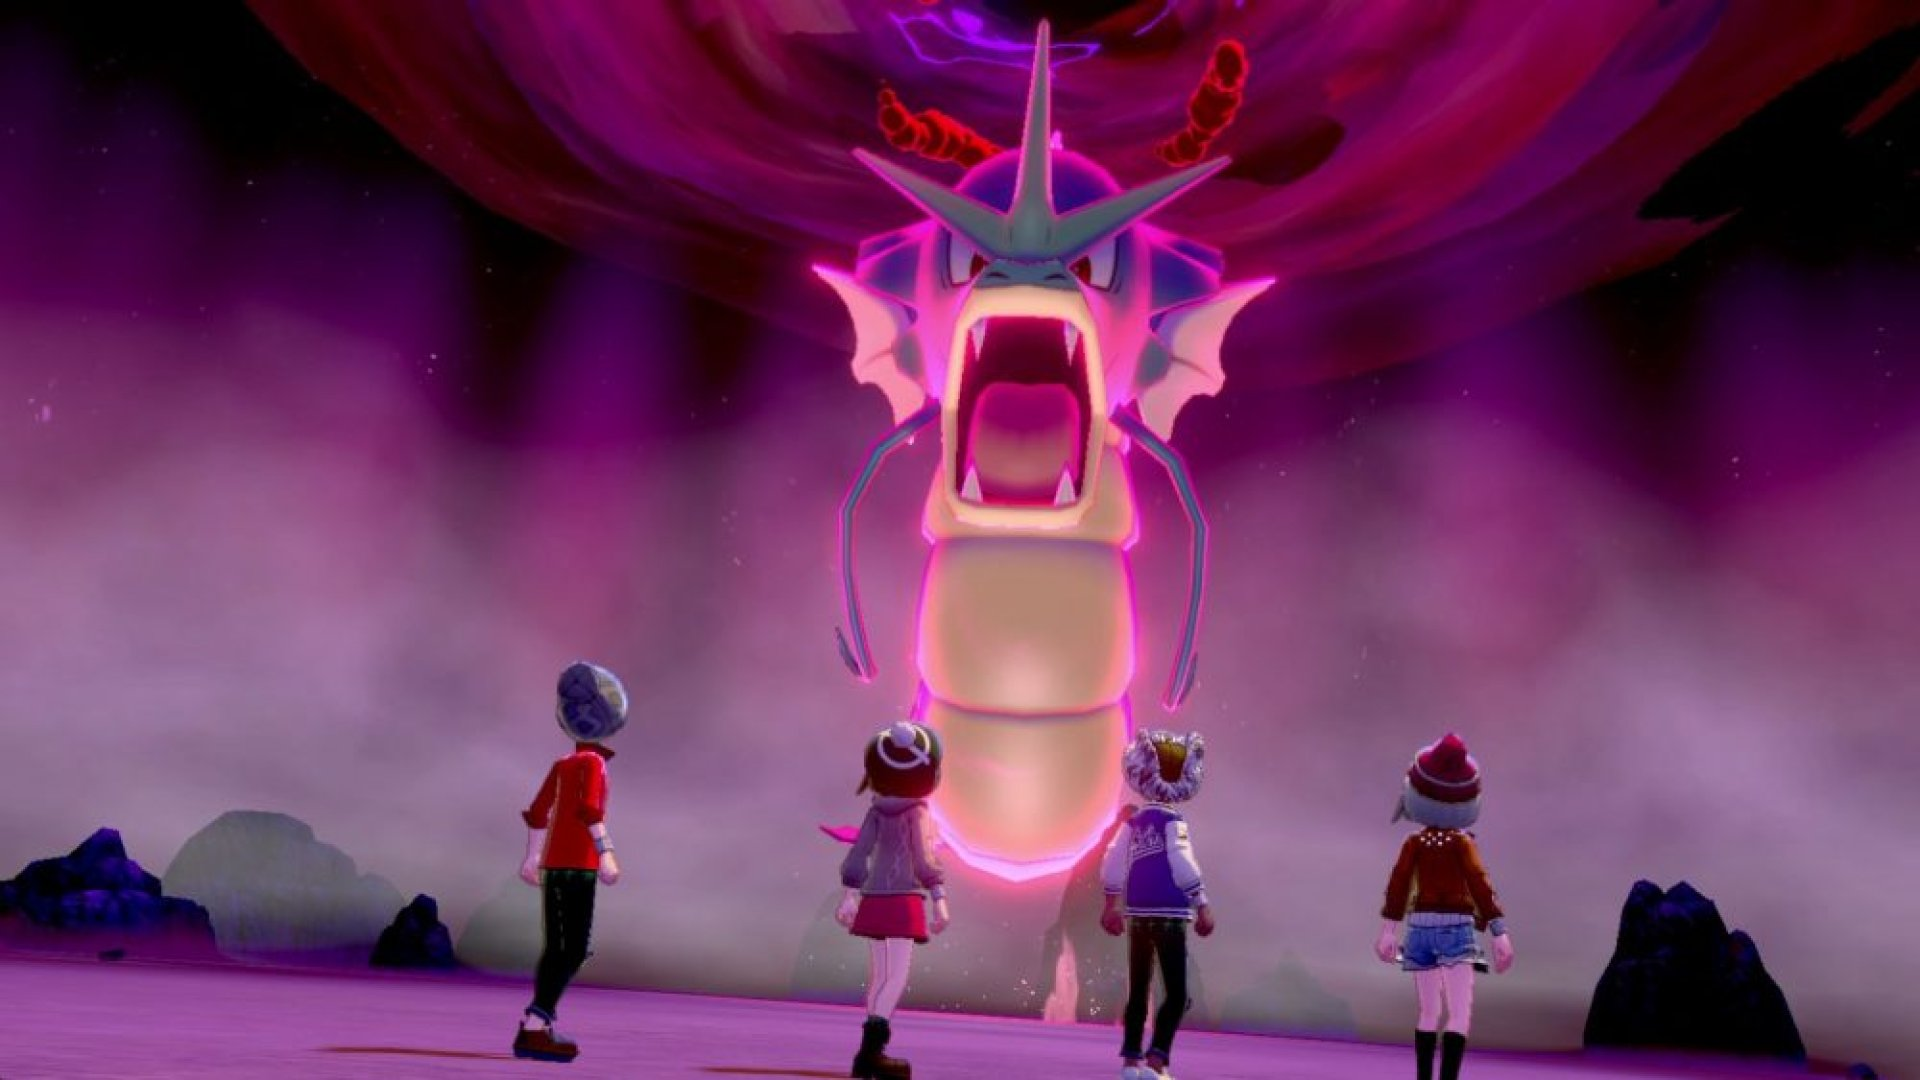 Pokémon Spada Pokémon Scudo screenshot